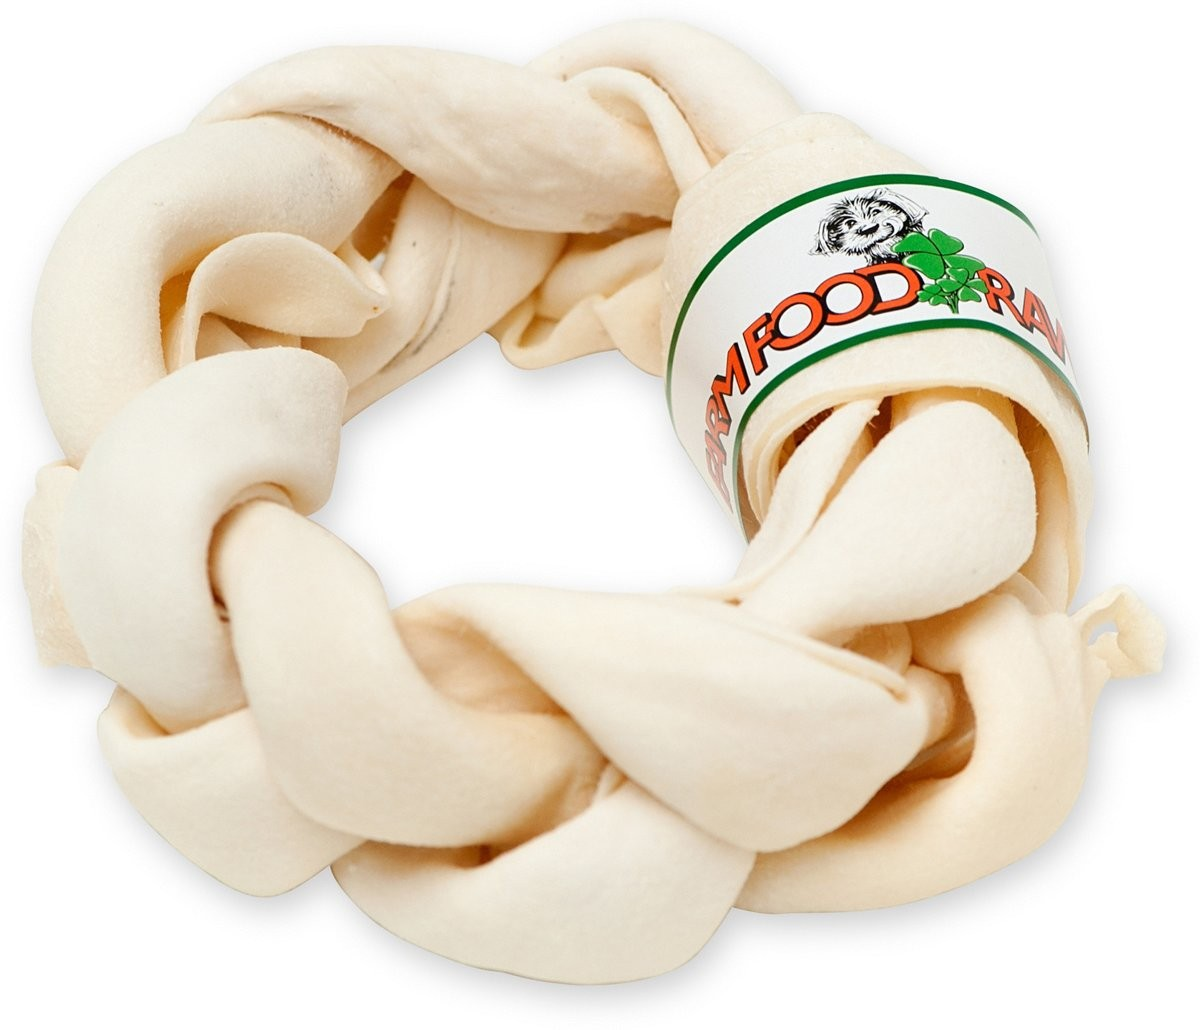 Farm food Dental Braided Donut S 13 – 15cm